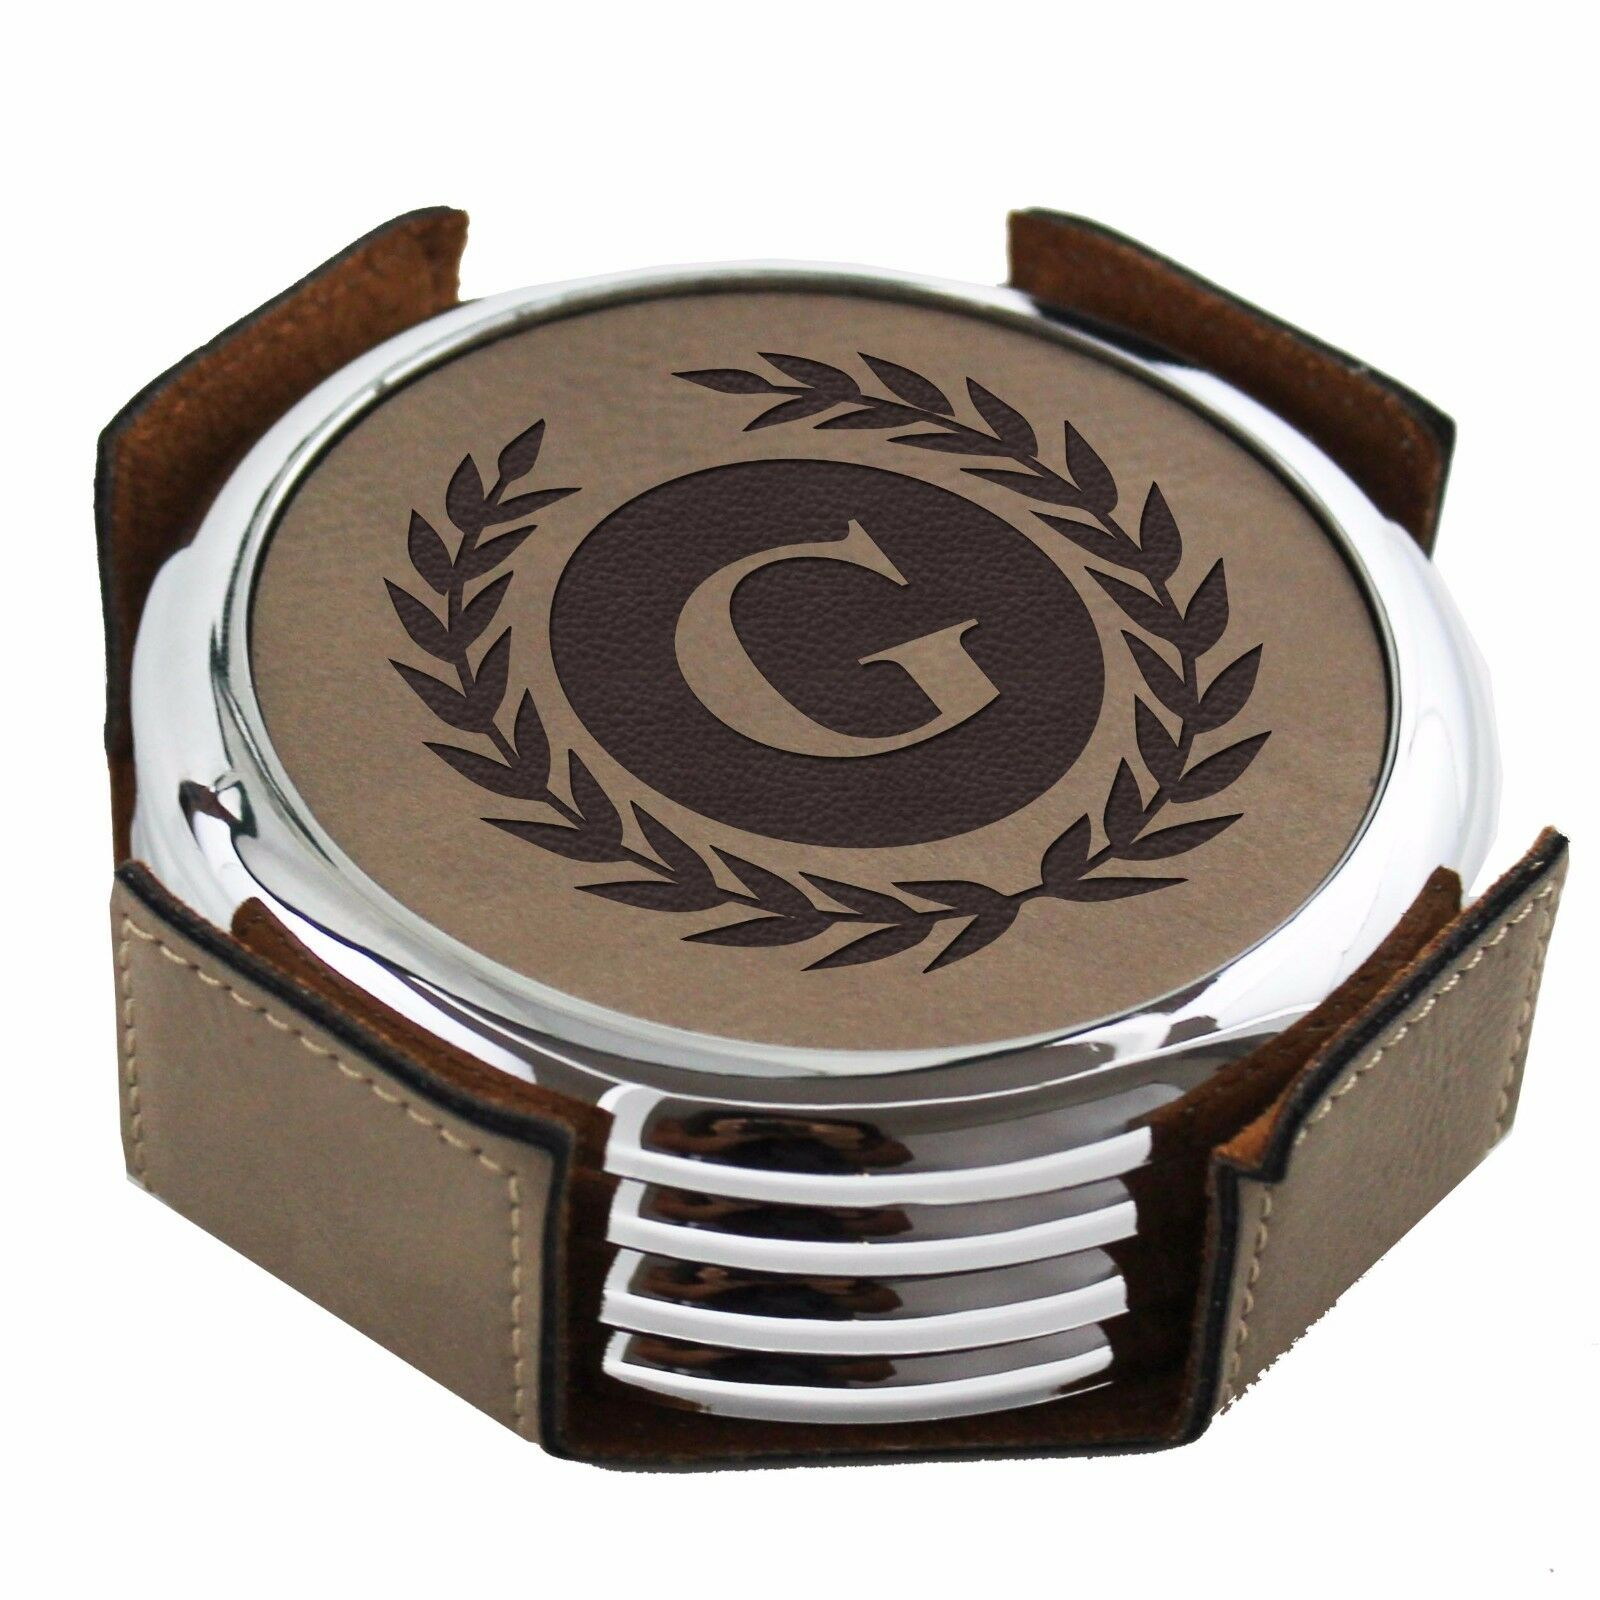 Custom engraved leather drink coasters housewarming for Handmade drink coasters